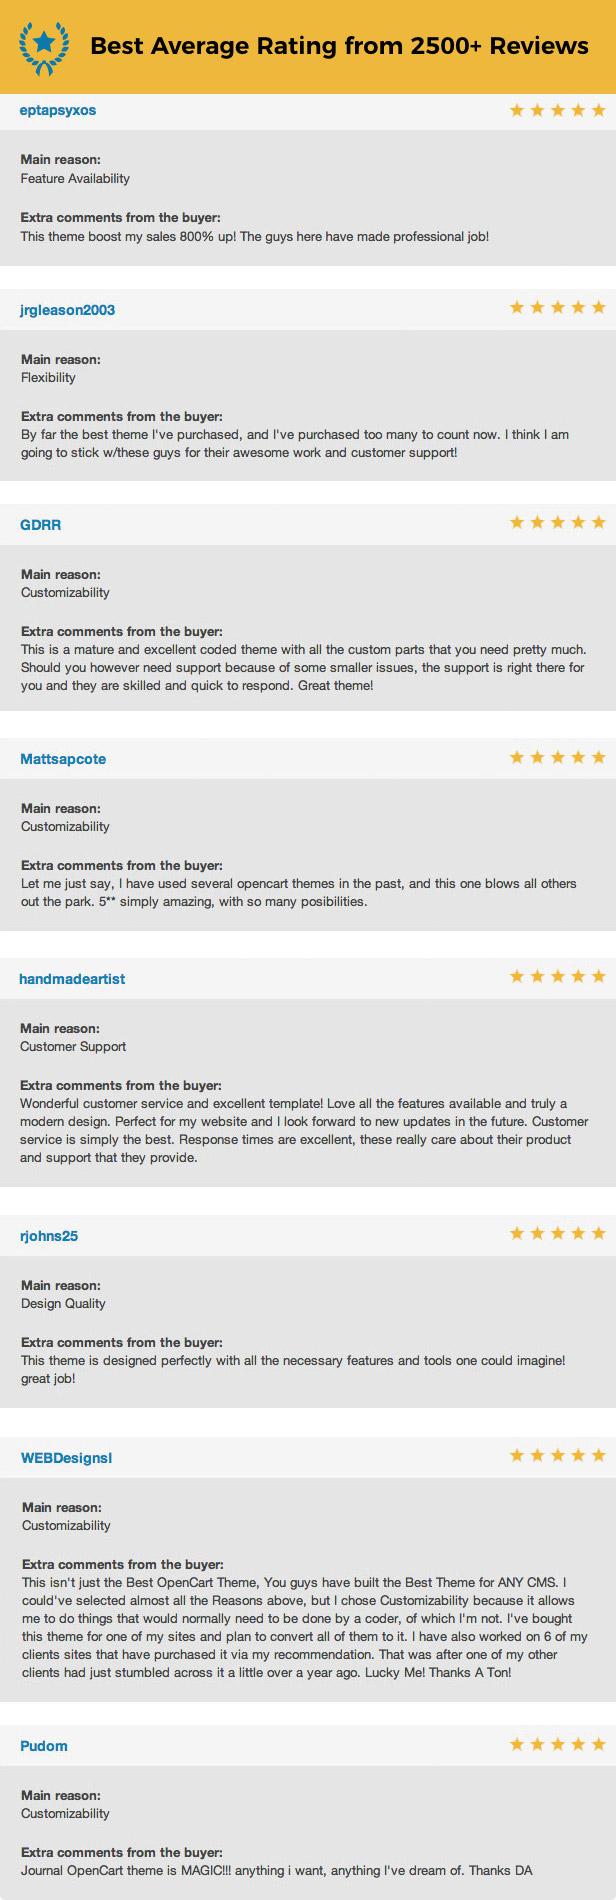 Themeforest | Journal - Advanced Opencart Theme Free Download #1 free download Themeforest | Journal - Advanced Opencart Theme Free Download #1 nulled Themeforest | Journal - Advanced Opencart Theme Free Download #1